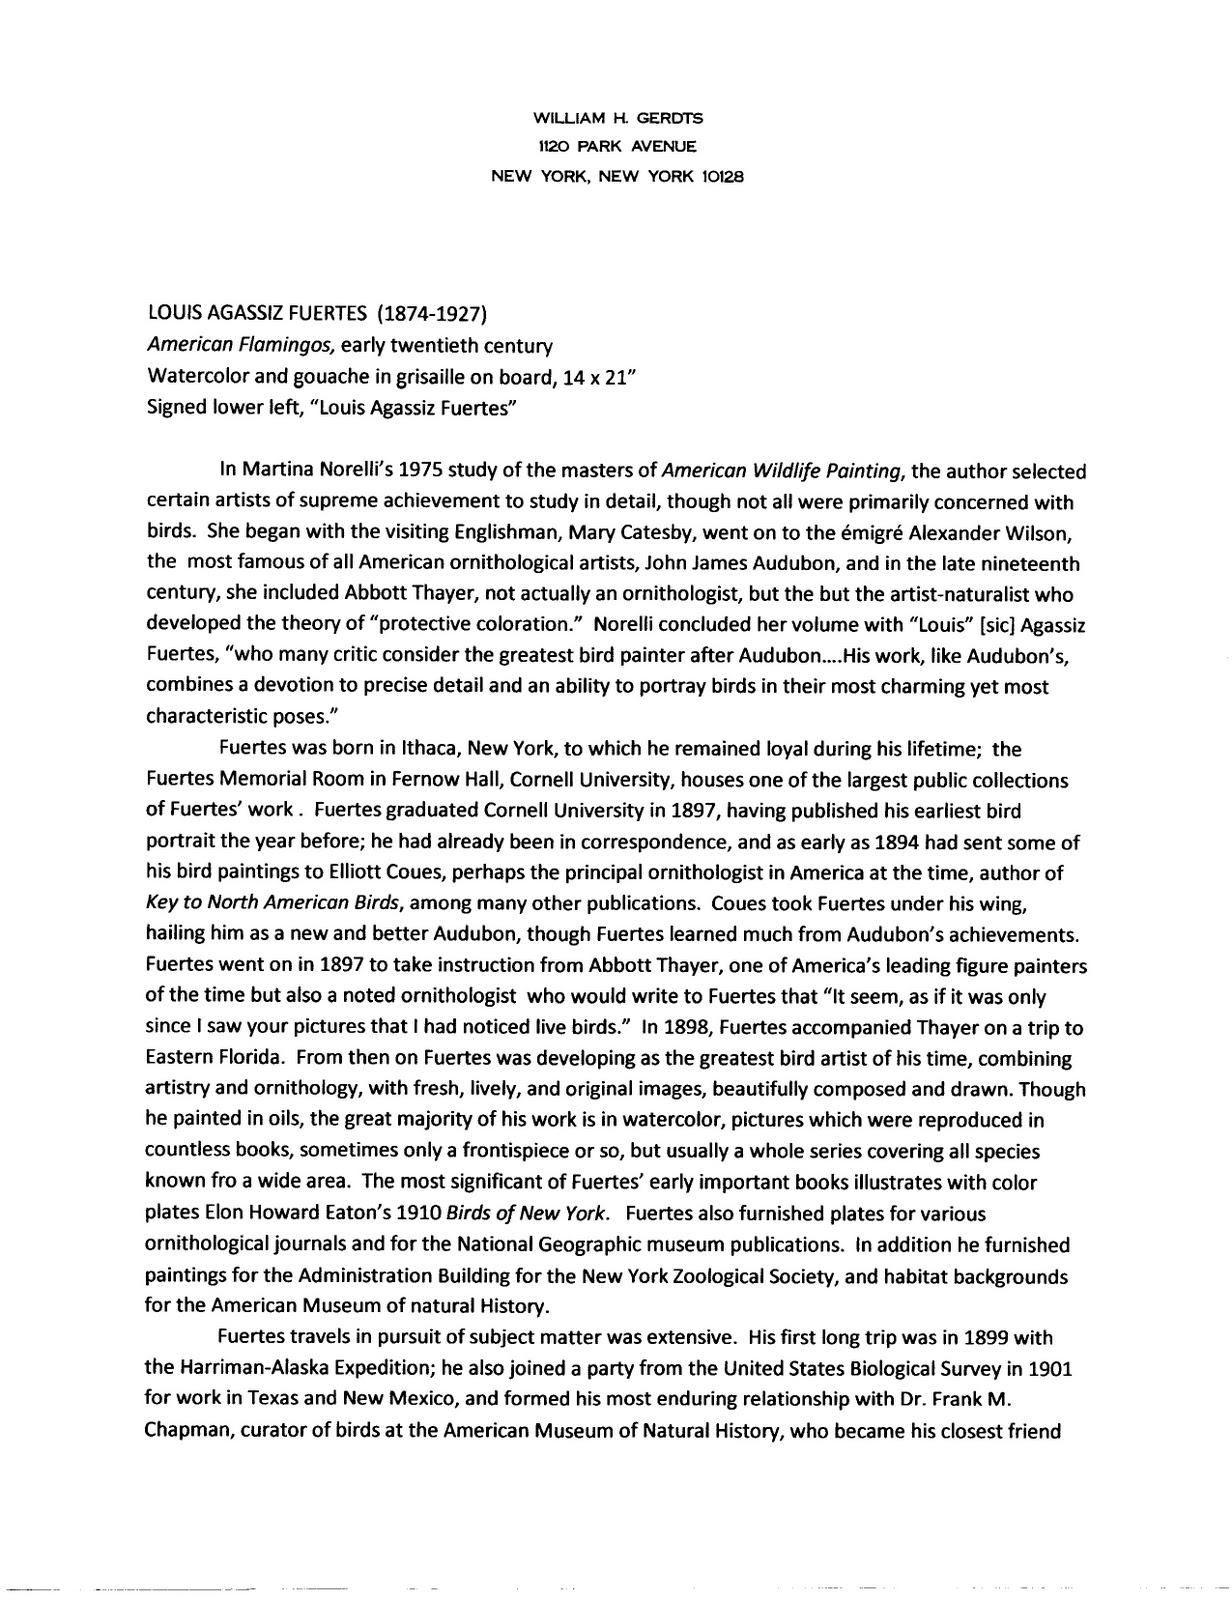 002 Graduate Admissions Essay Fuertes20american20flamingos20001 Wondrous Sample Education Examples Nursing Admission Samples Full